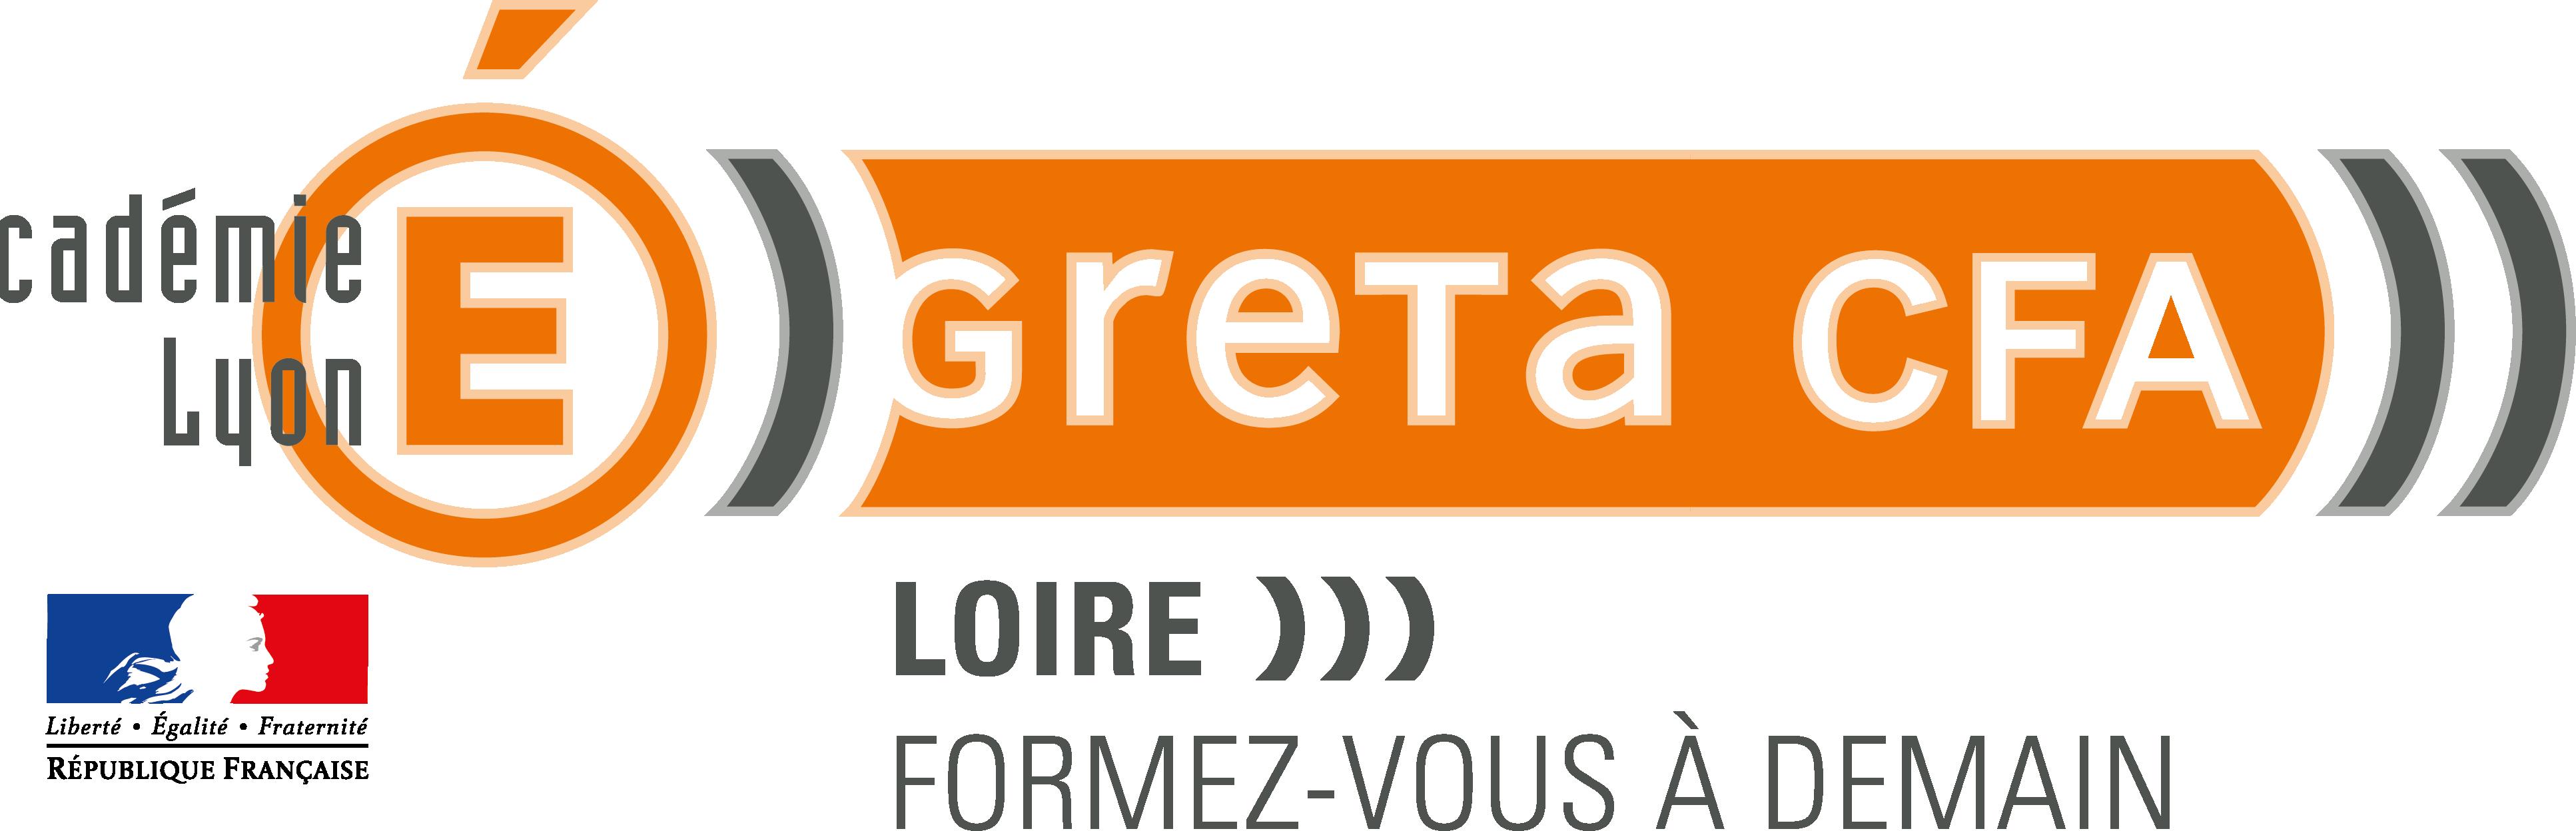 LOGO GRETA CFA loire 4c (1).png